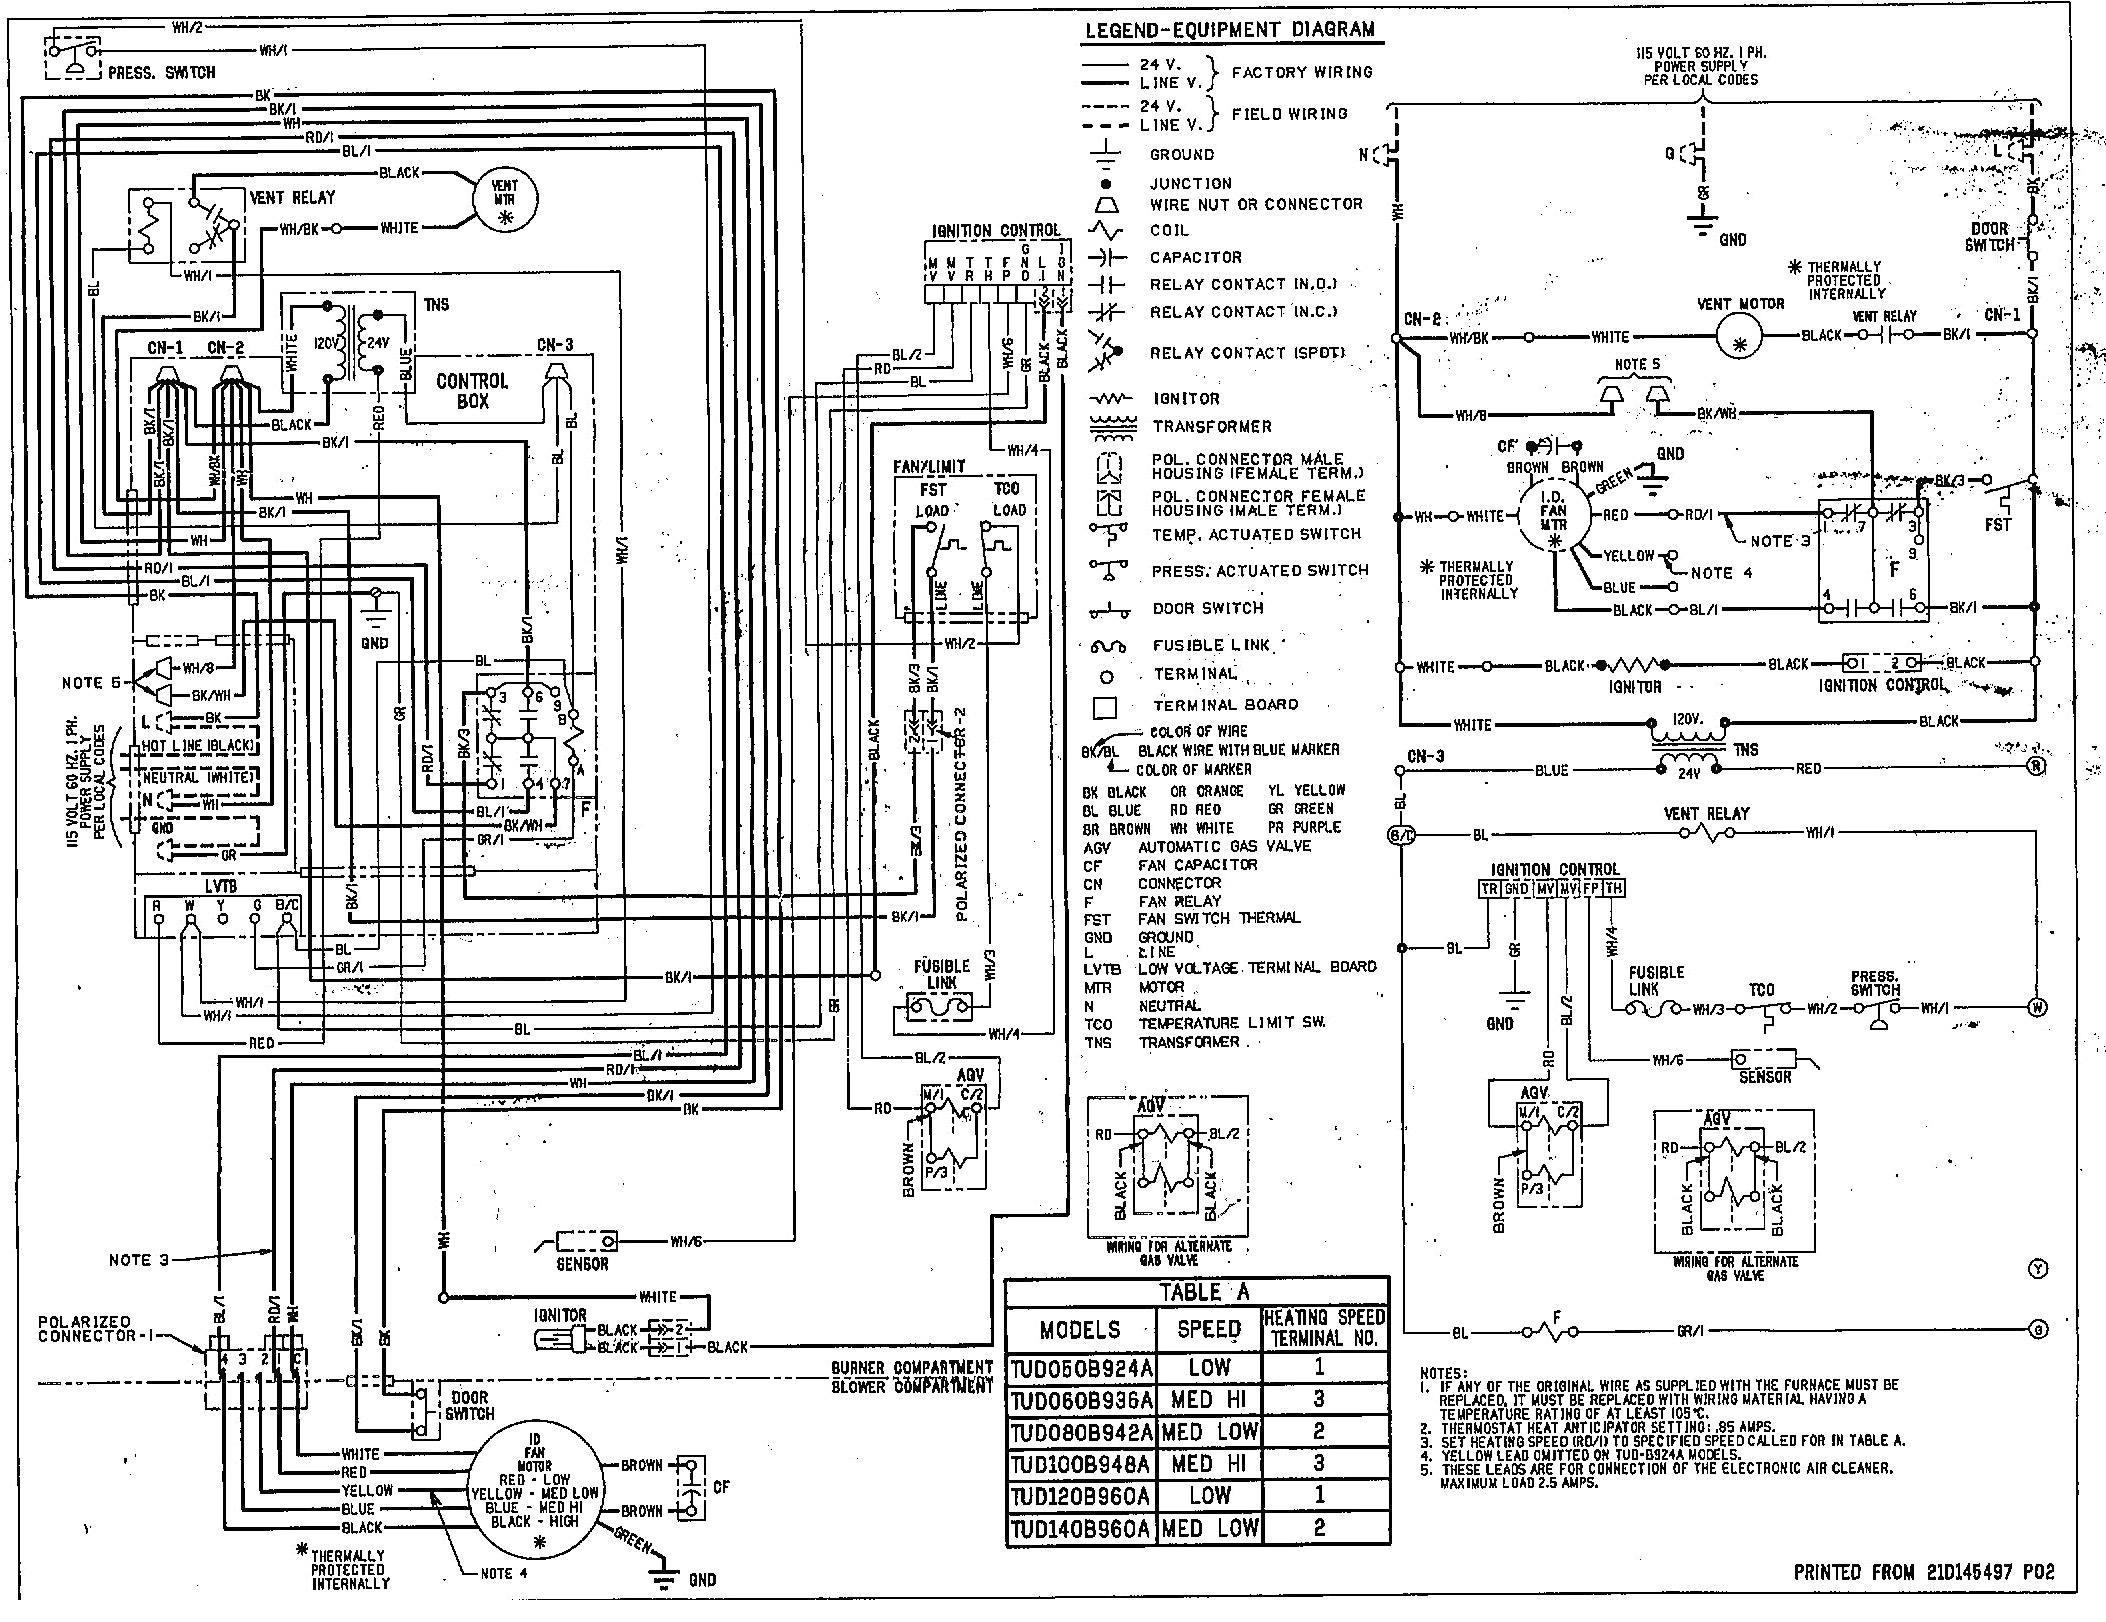 American Standard Wiring Diagrams